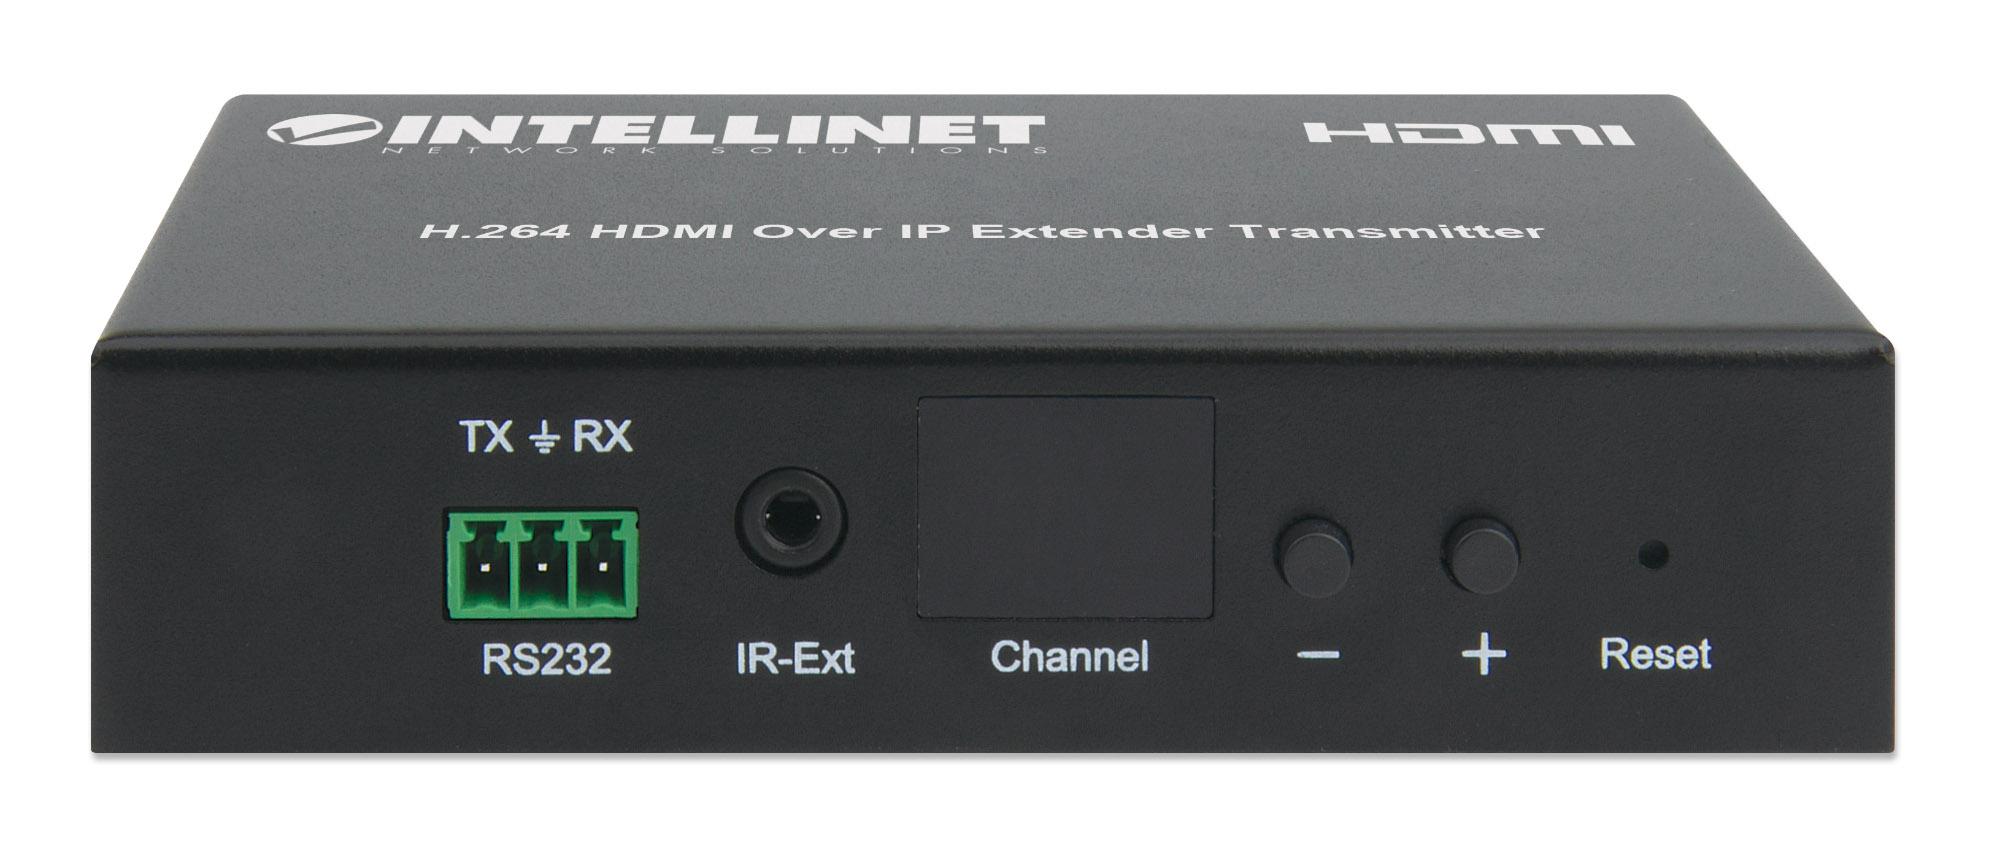 H.264 HDMI Over IP Extender Transmitter